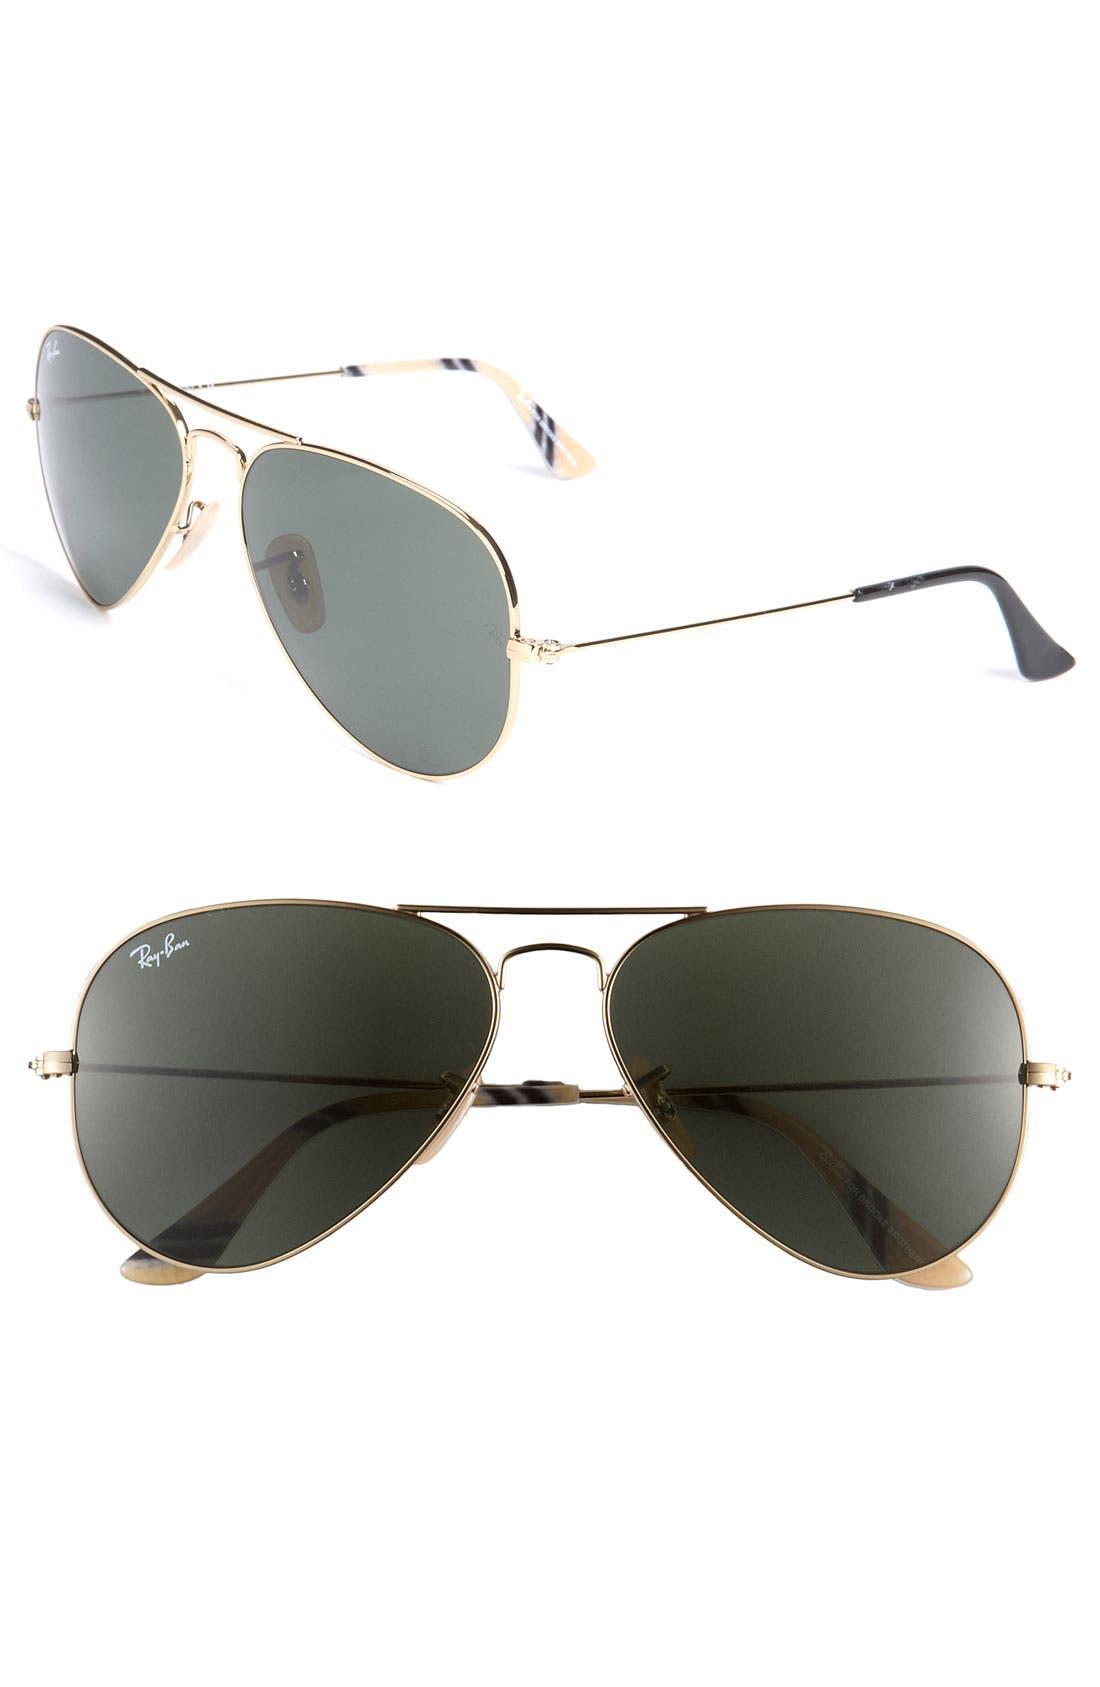 Main Image - Ray-Ban Original Aviator 58mm Sunglasses